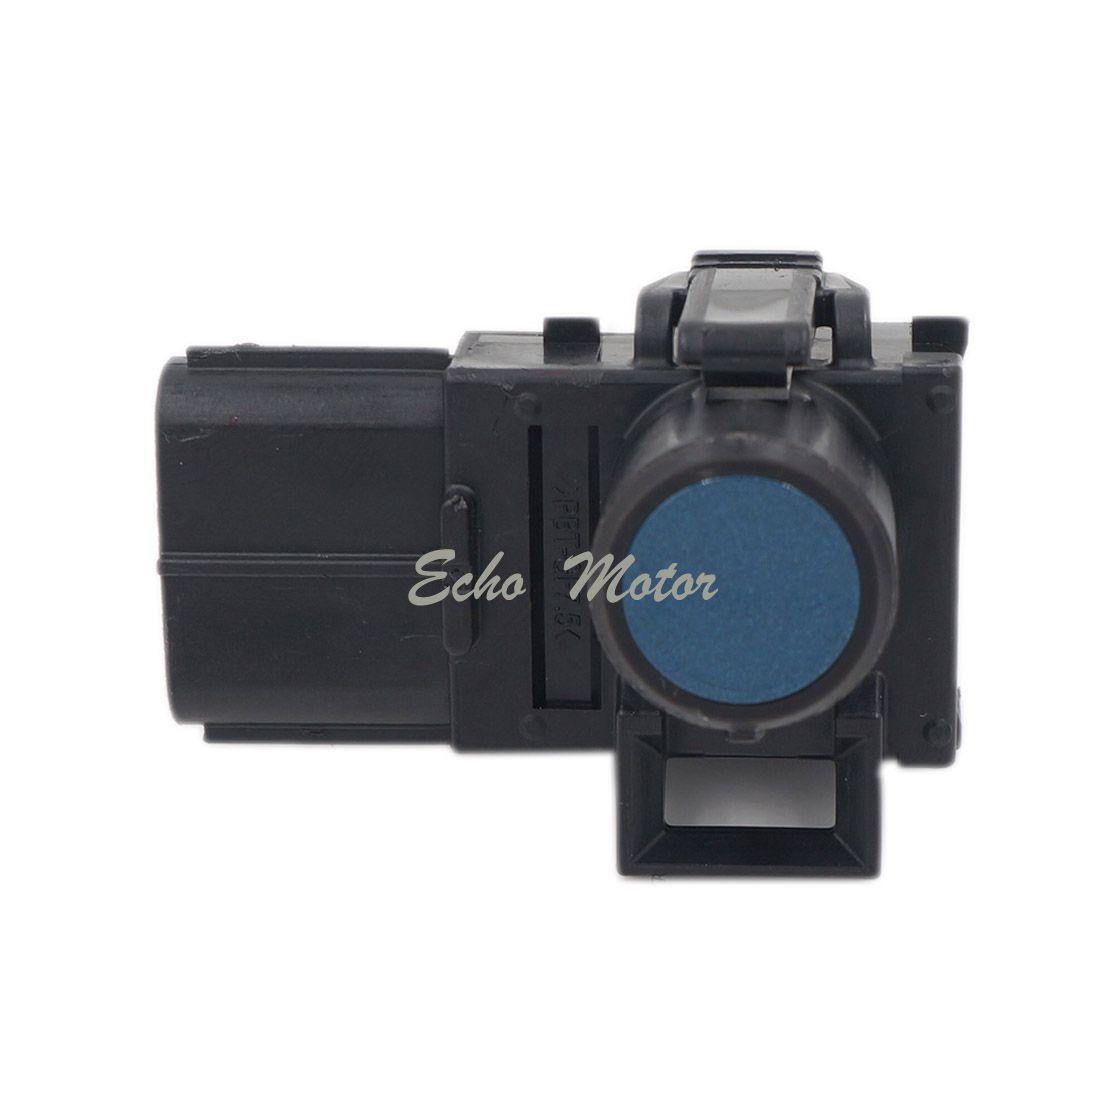 NUOVO 89341-33160 Sensore di parcheggio PDC Toyota Sequoia 2008-2012, Lexus LX570 2007-2009, Aurion 2007 Blue Color Genuine